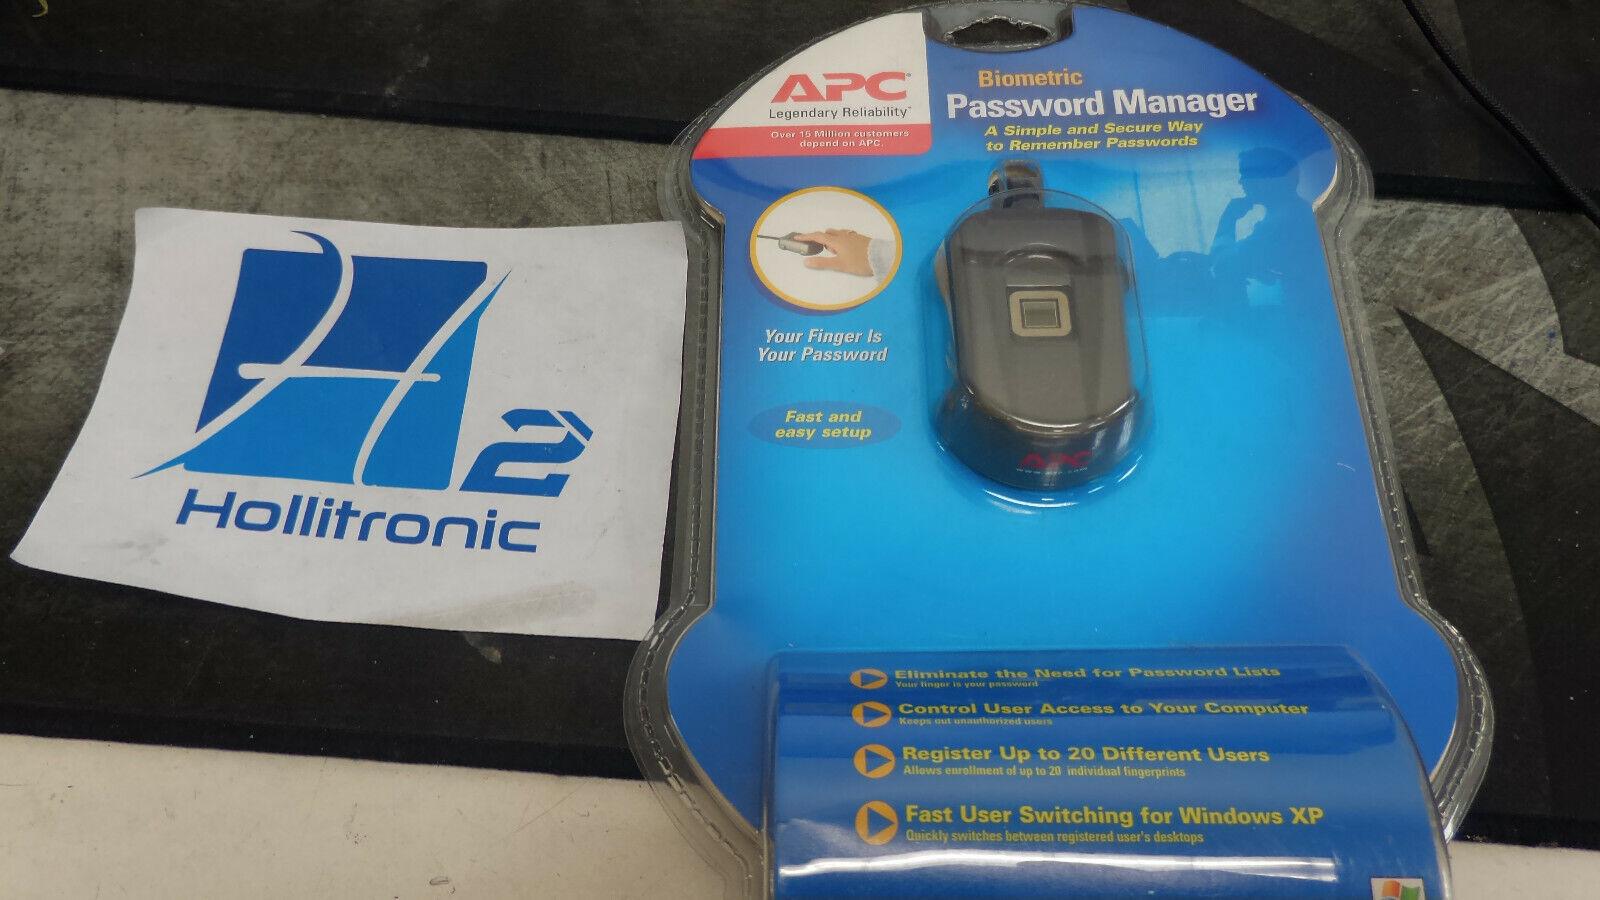 APC BIOMETRIC PASSWORD MANAGER WINDOWS DRIVER